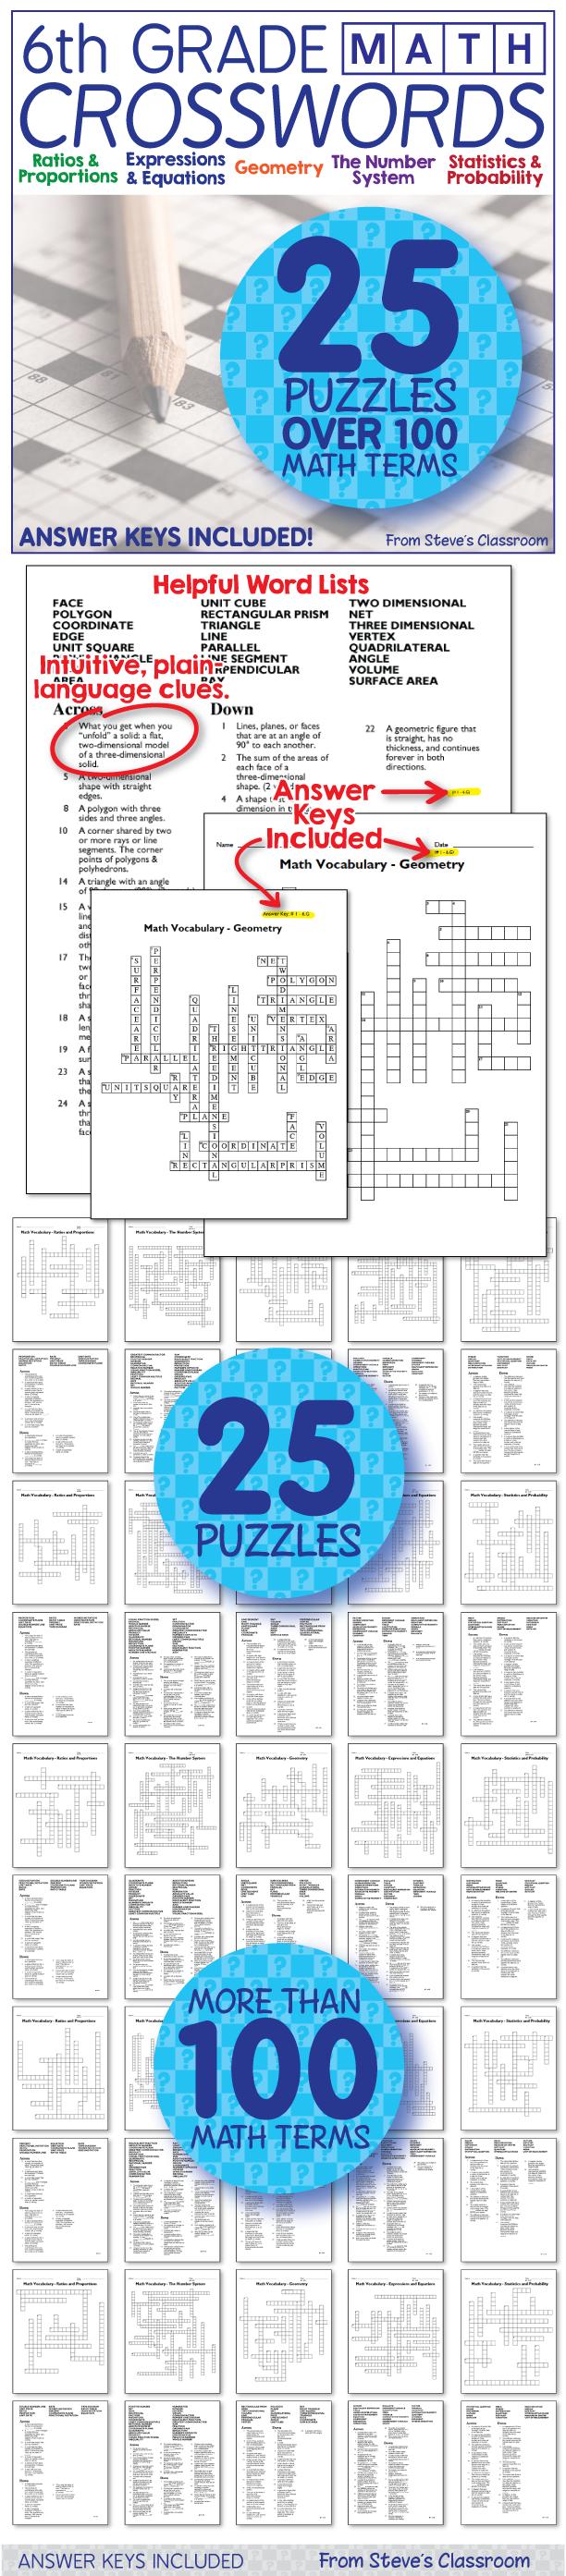 Math Worksheets 6th Grade Math Vocabulary Crossword Puzzles Math